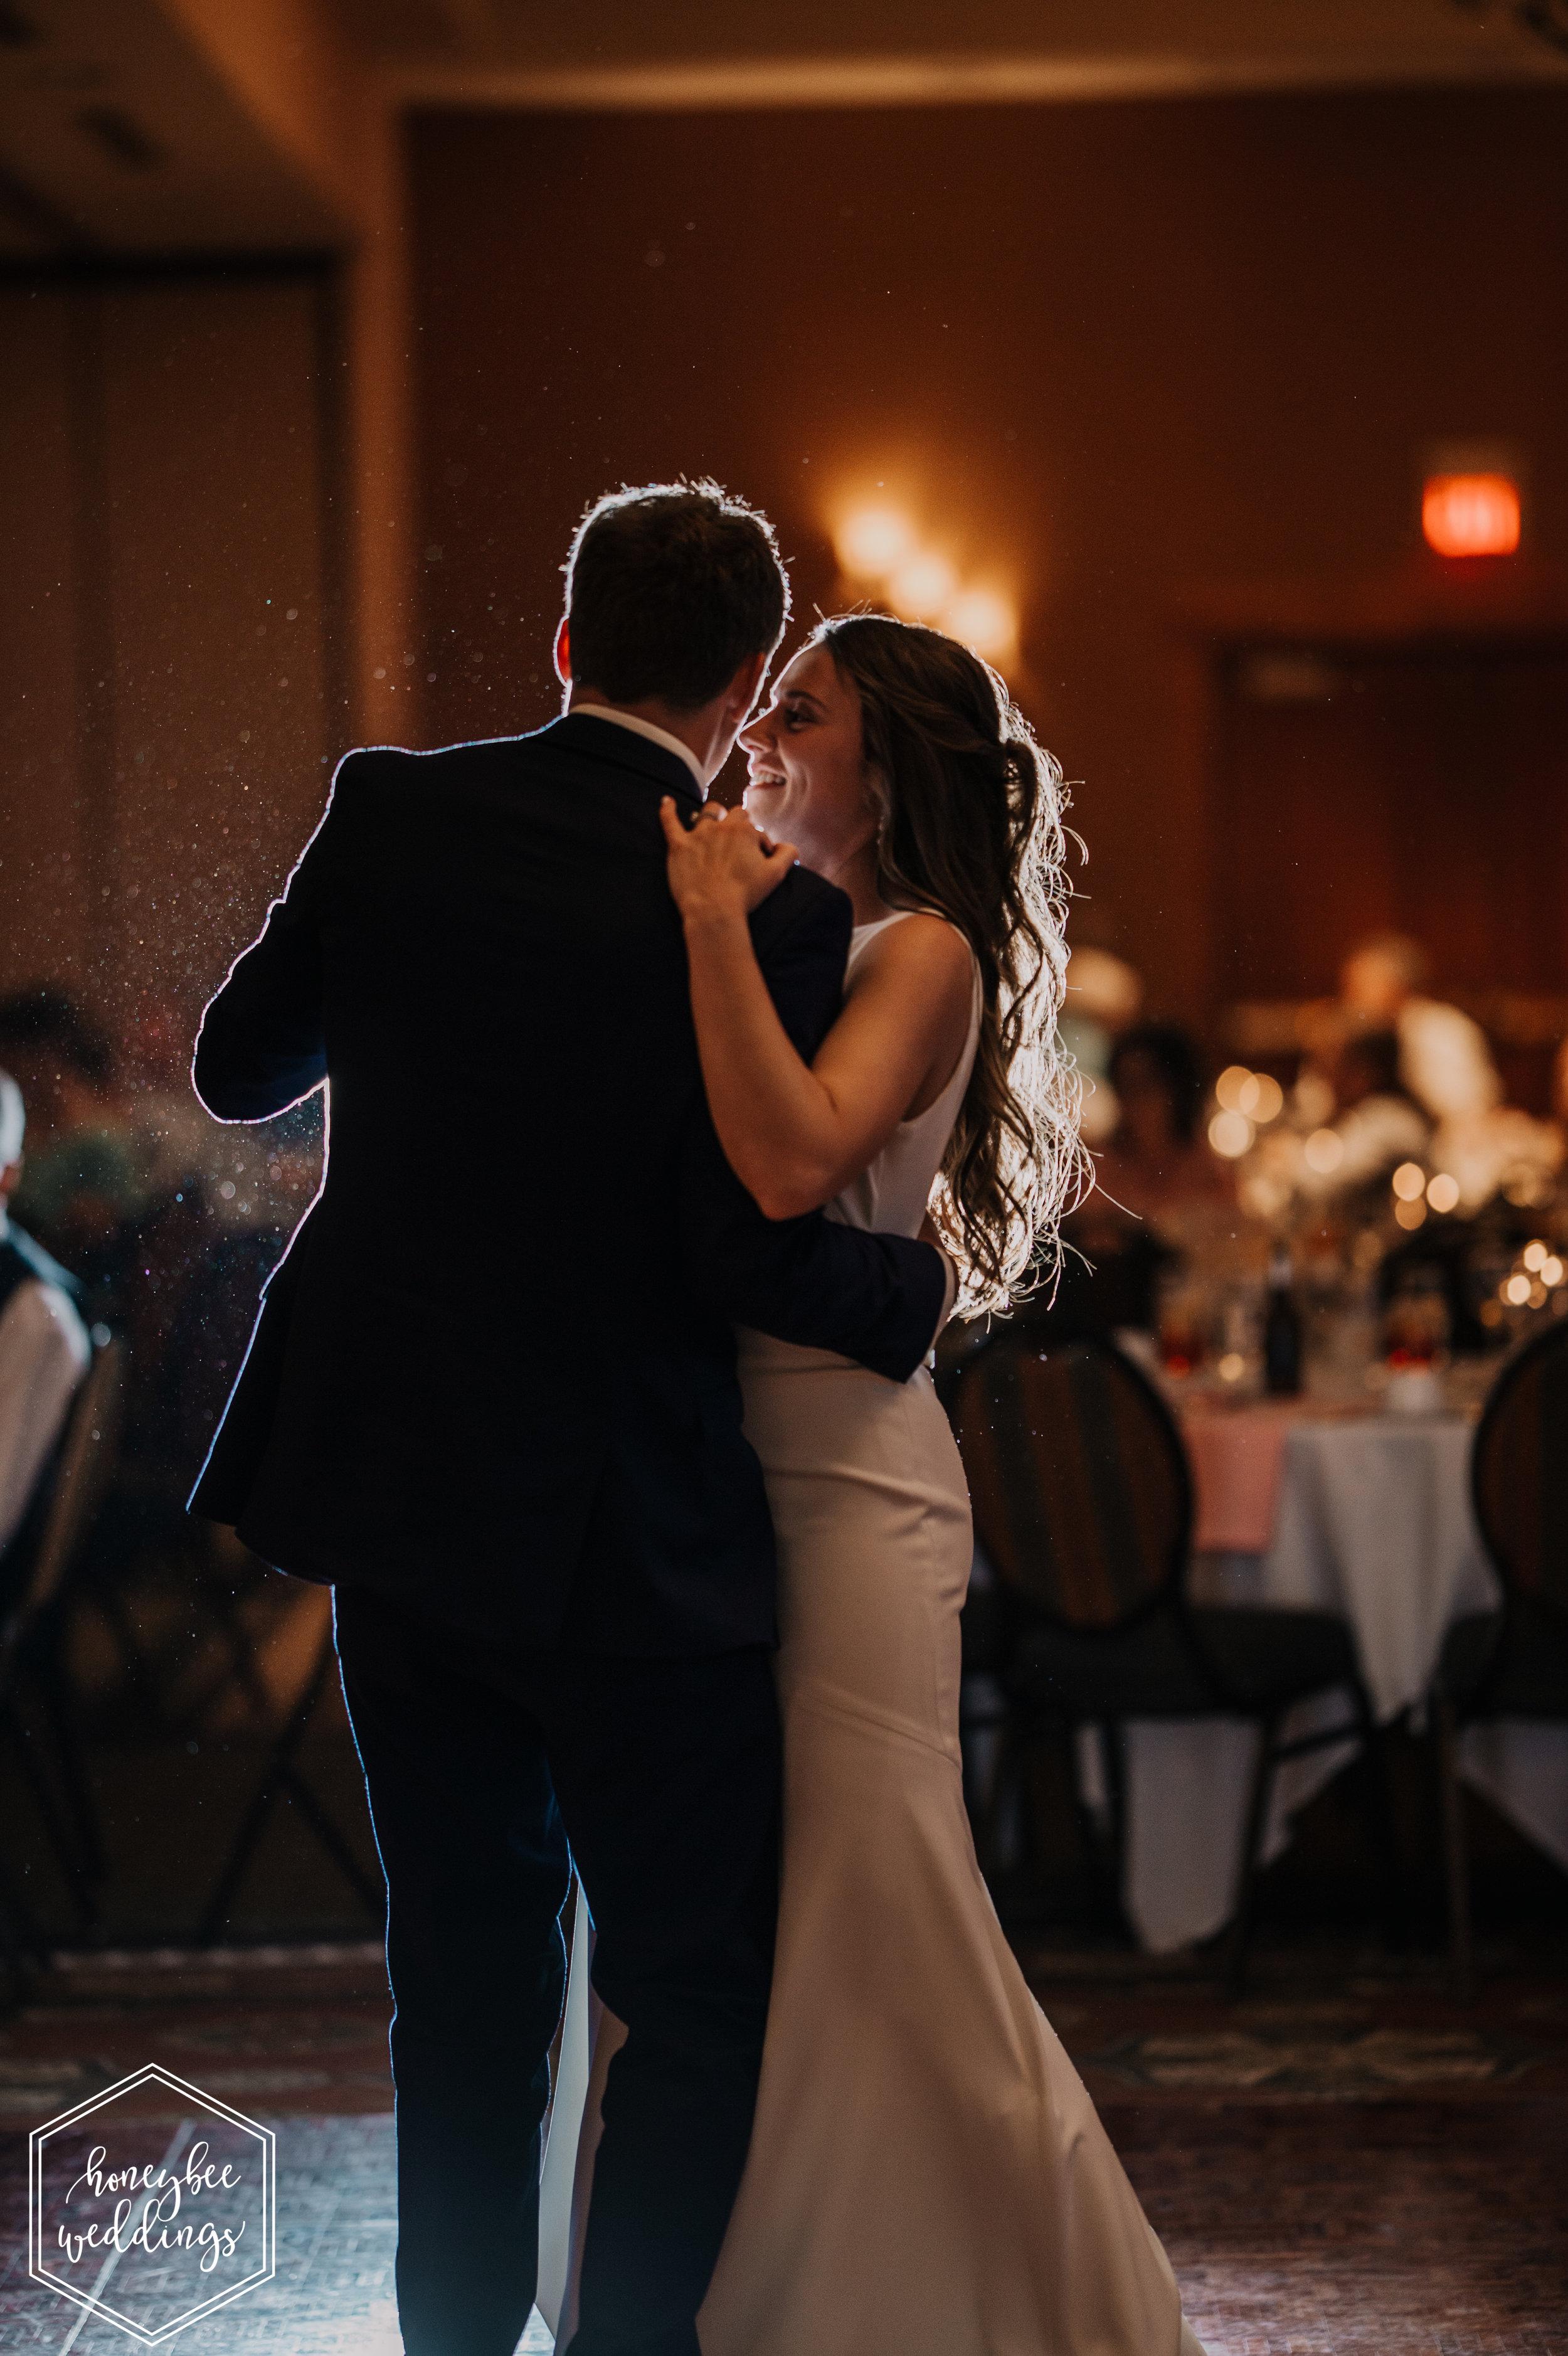 317 Montana Wedding Photographer_St. Francis Wedding_Tifani Zanto + Ryan Burke -6246-2.jpg